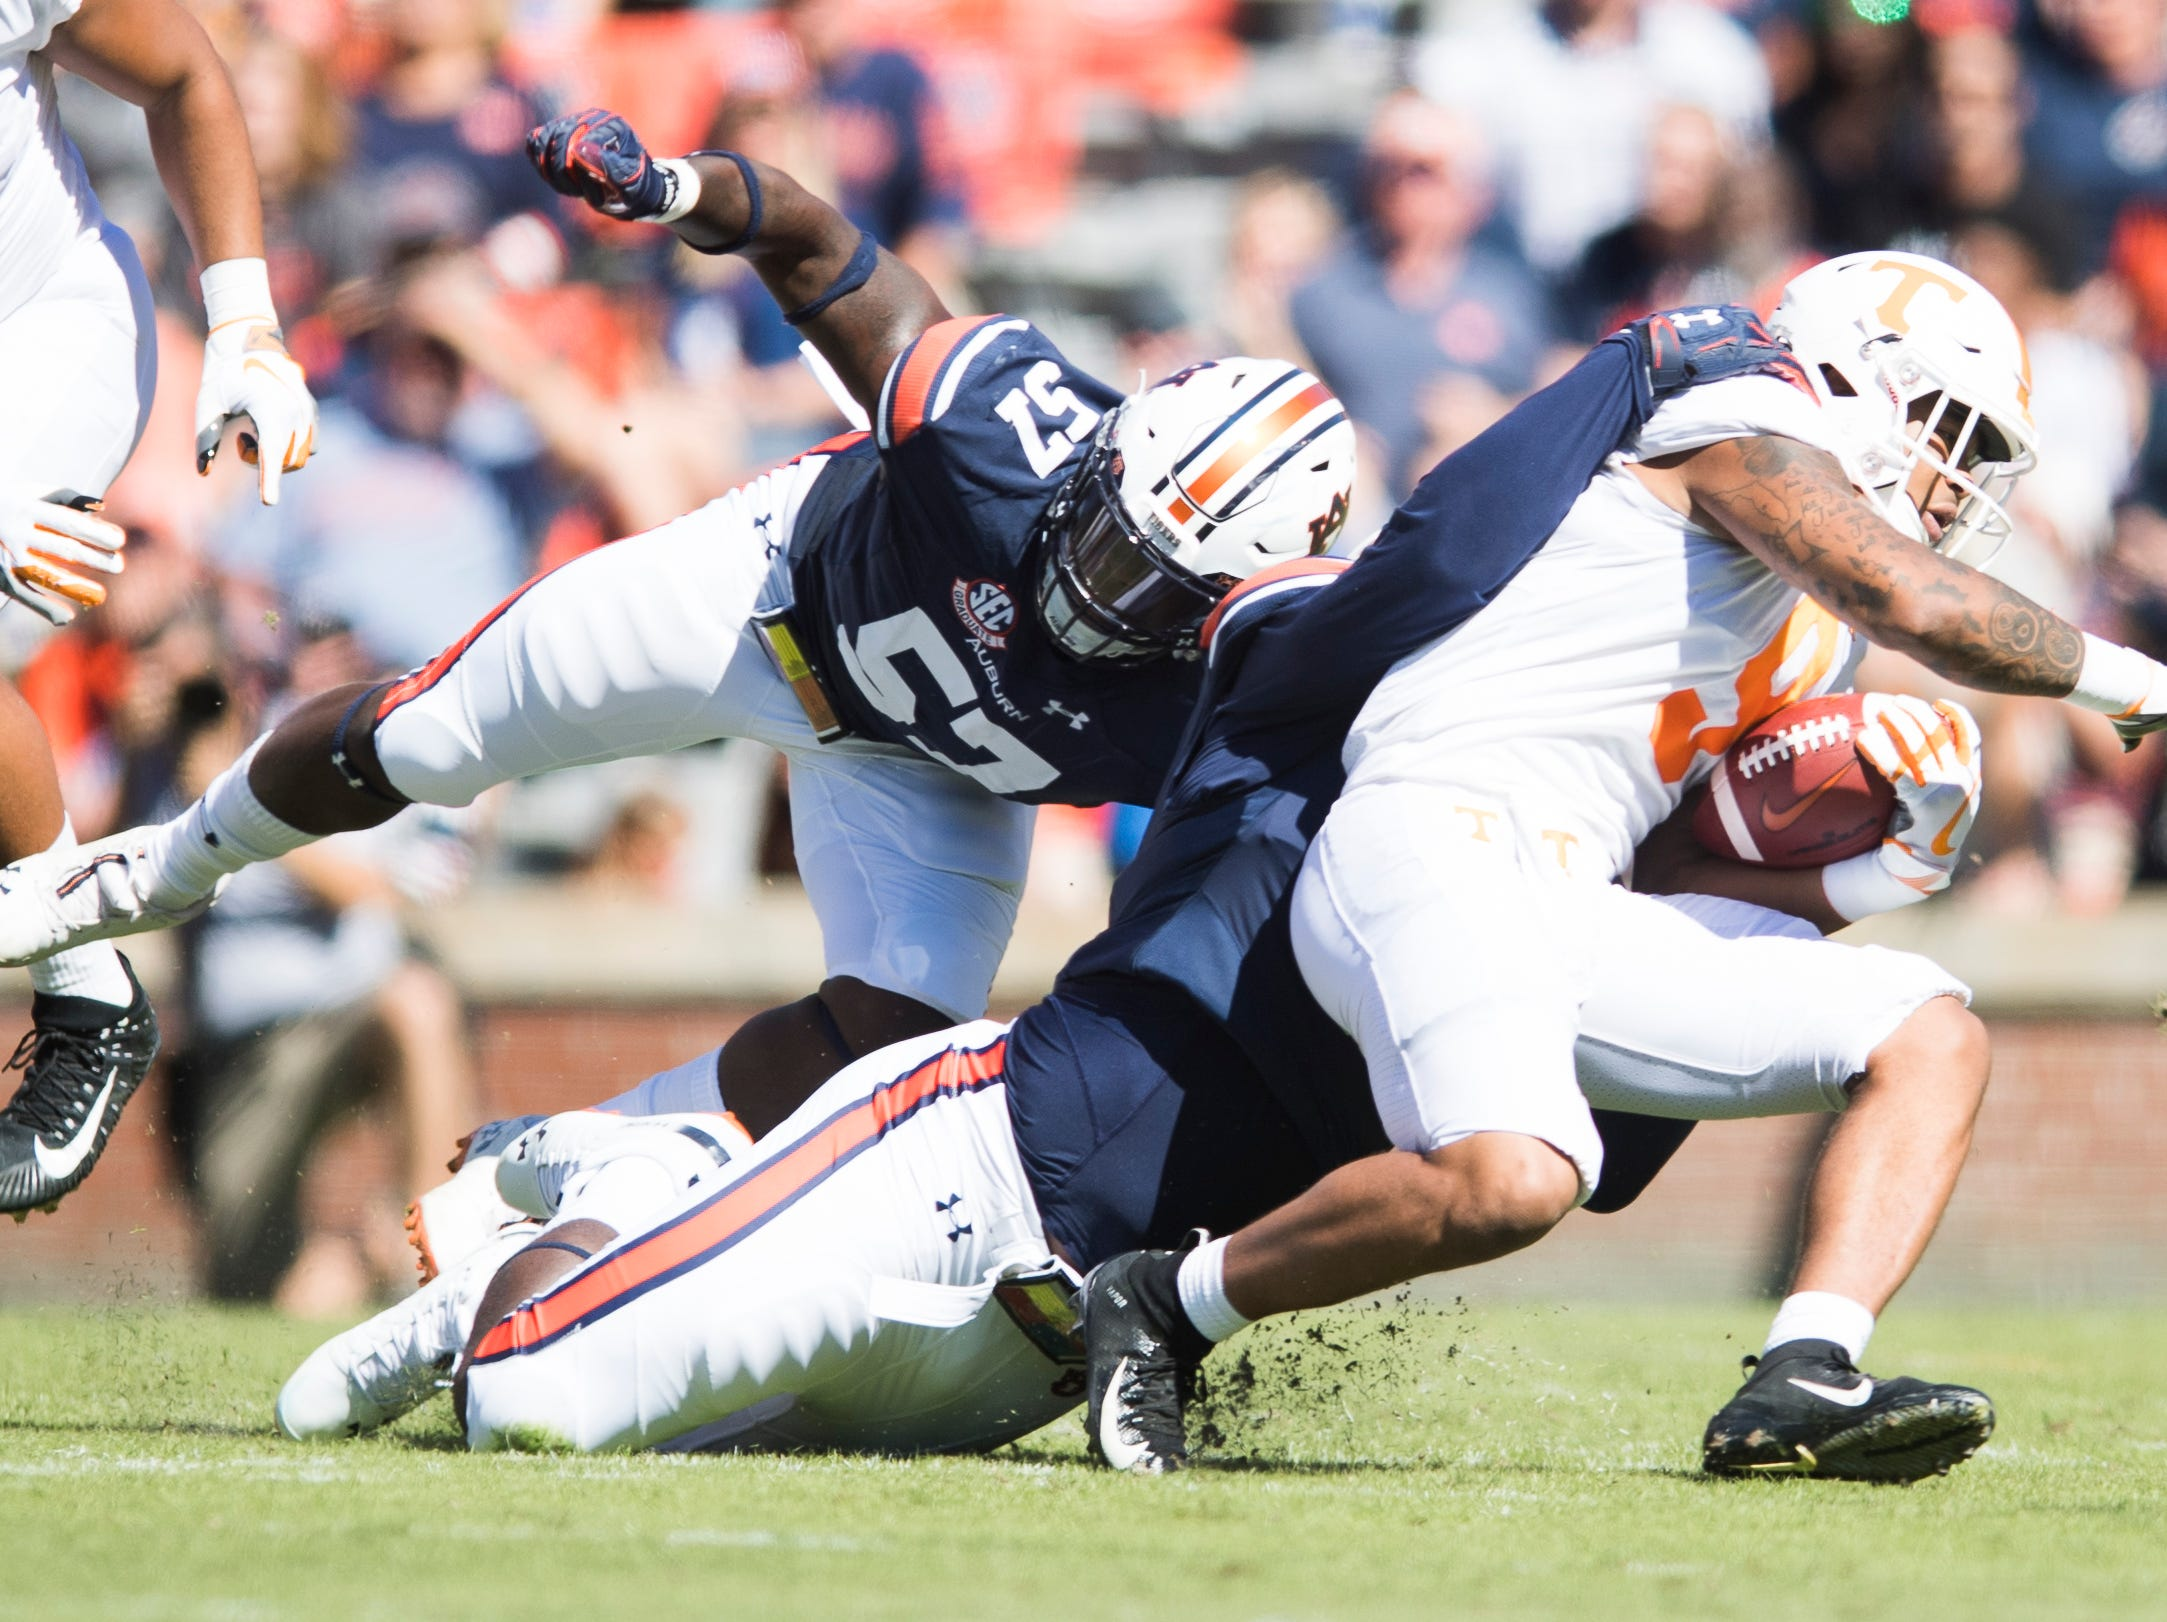 Tennessee running back Tim Jordan (9) is taken down by Auburn defensive lineman Marlon Davidson (3) and Auburn linebacker Deshaun Davis (57) during a game between Tennessee and Auburn at Jordan-Hare Stadium in Auburn, Alabama on Saturday, October 13, 2018.